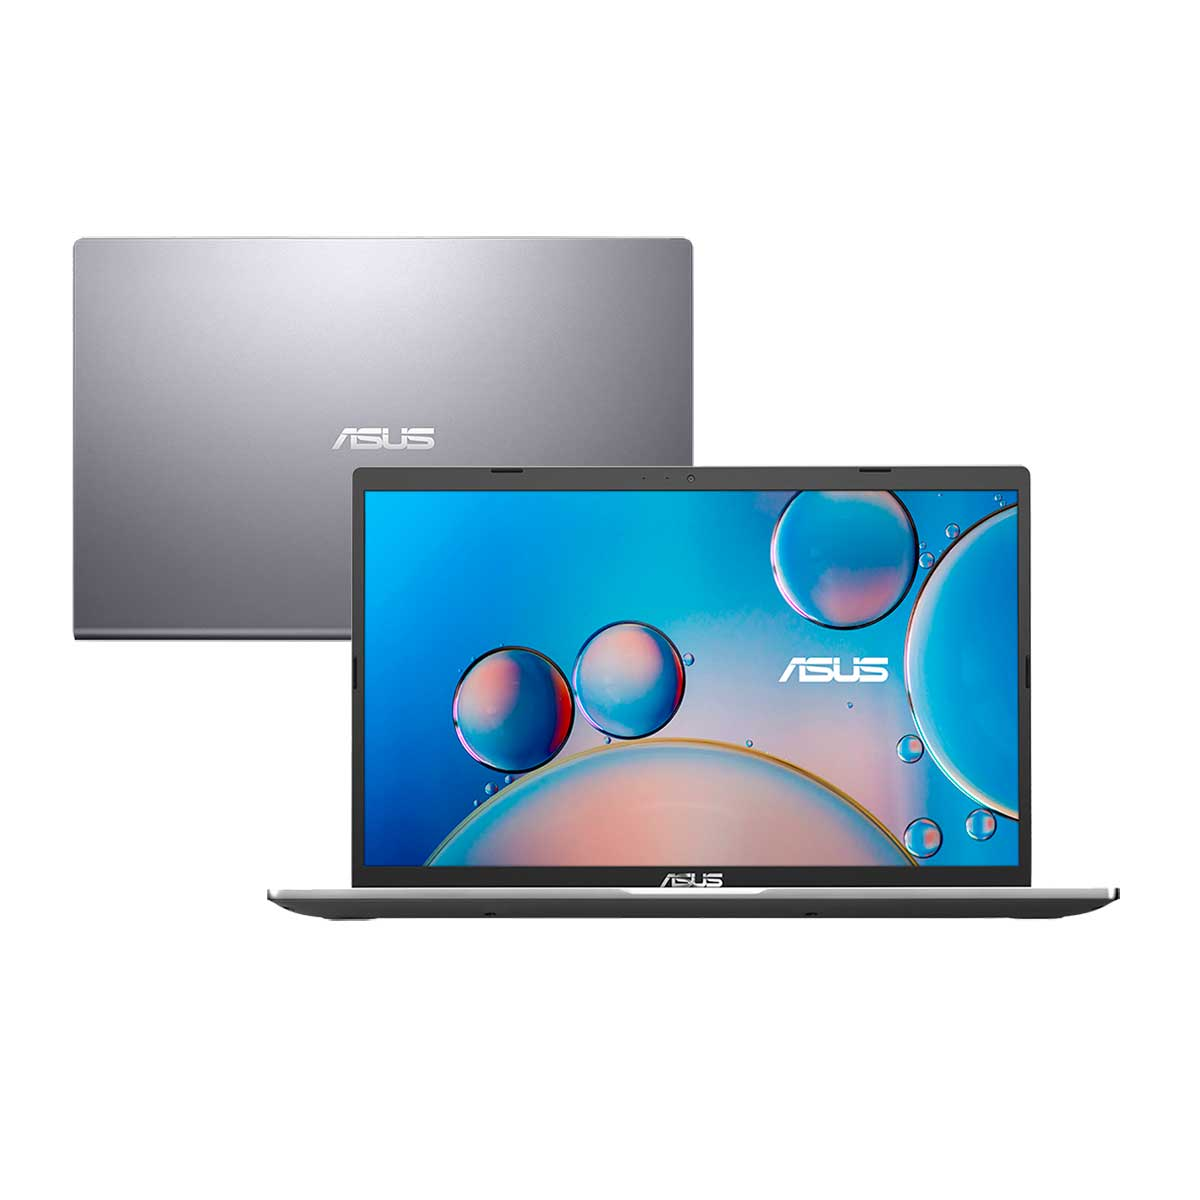 Imagem de Notebook Asus Intel Core I5 1035g1 8gb 256gb Ssd Linux 15.6